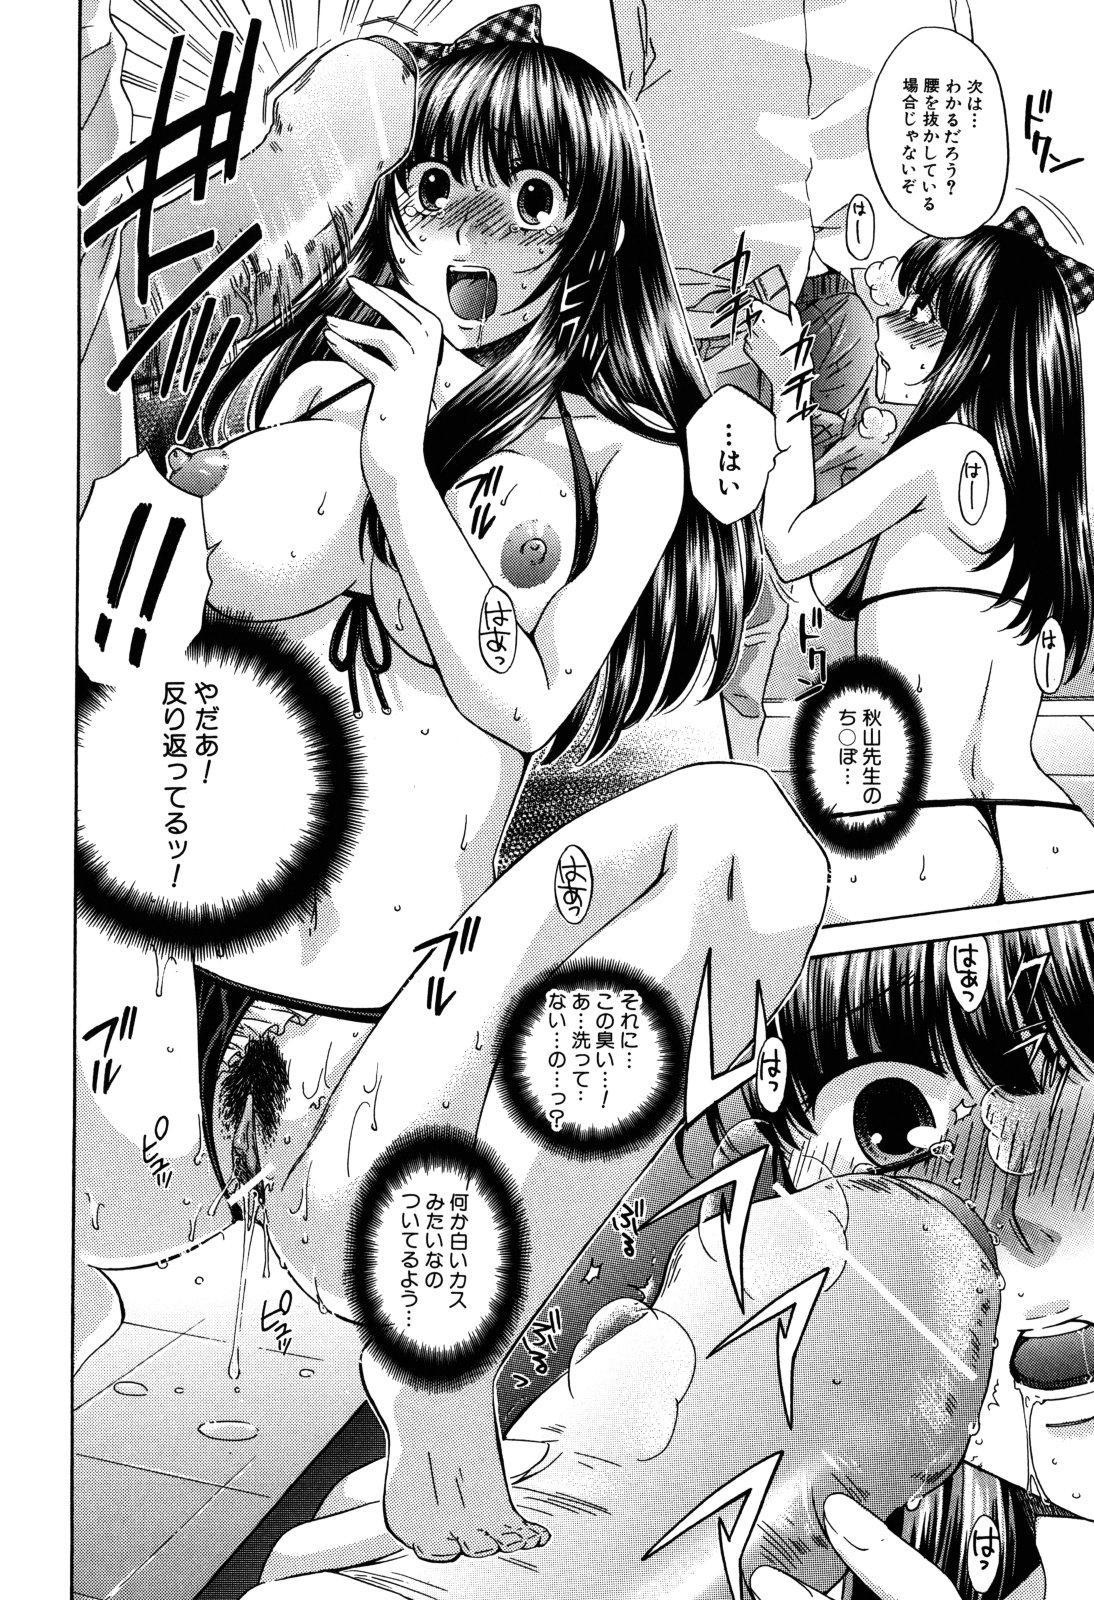 Kanojo ga Ochiru made - She in the depth 37